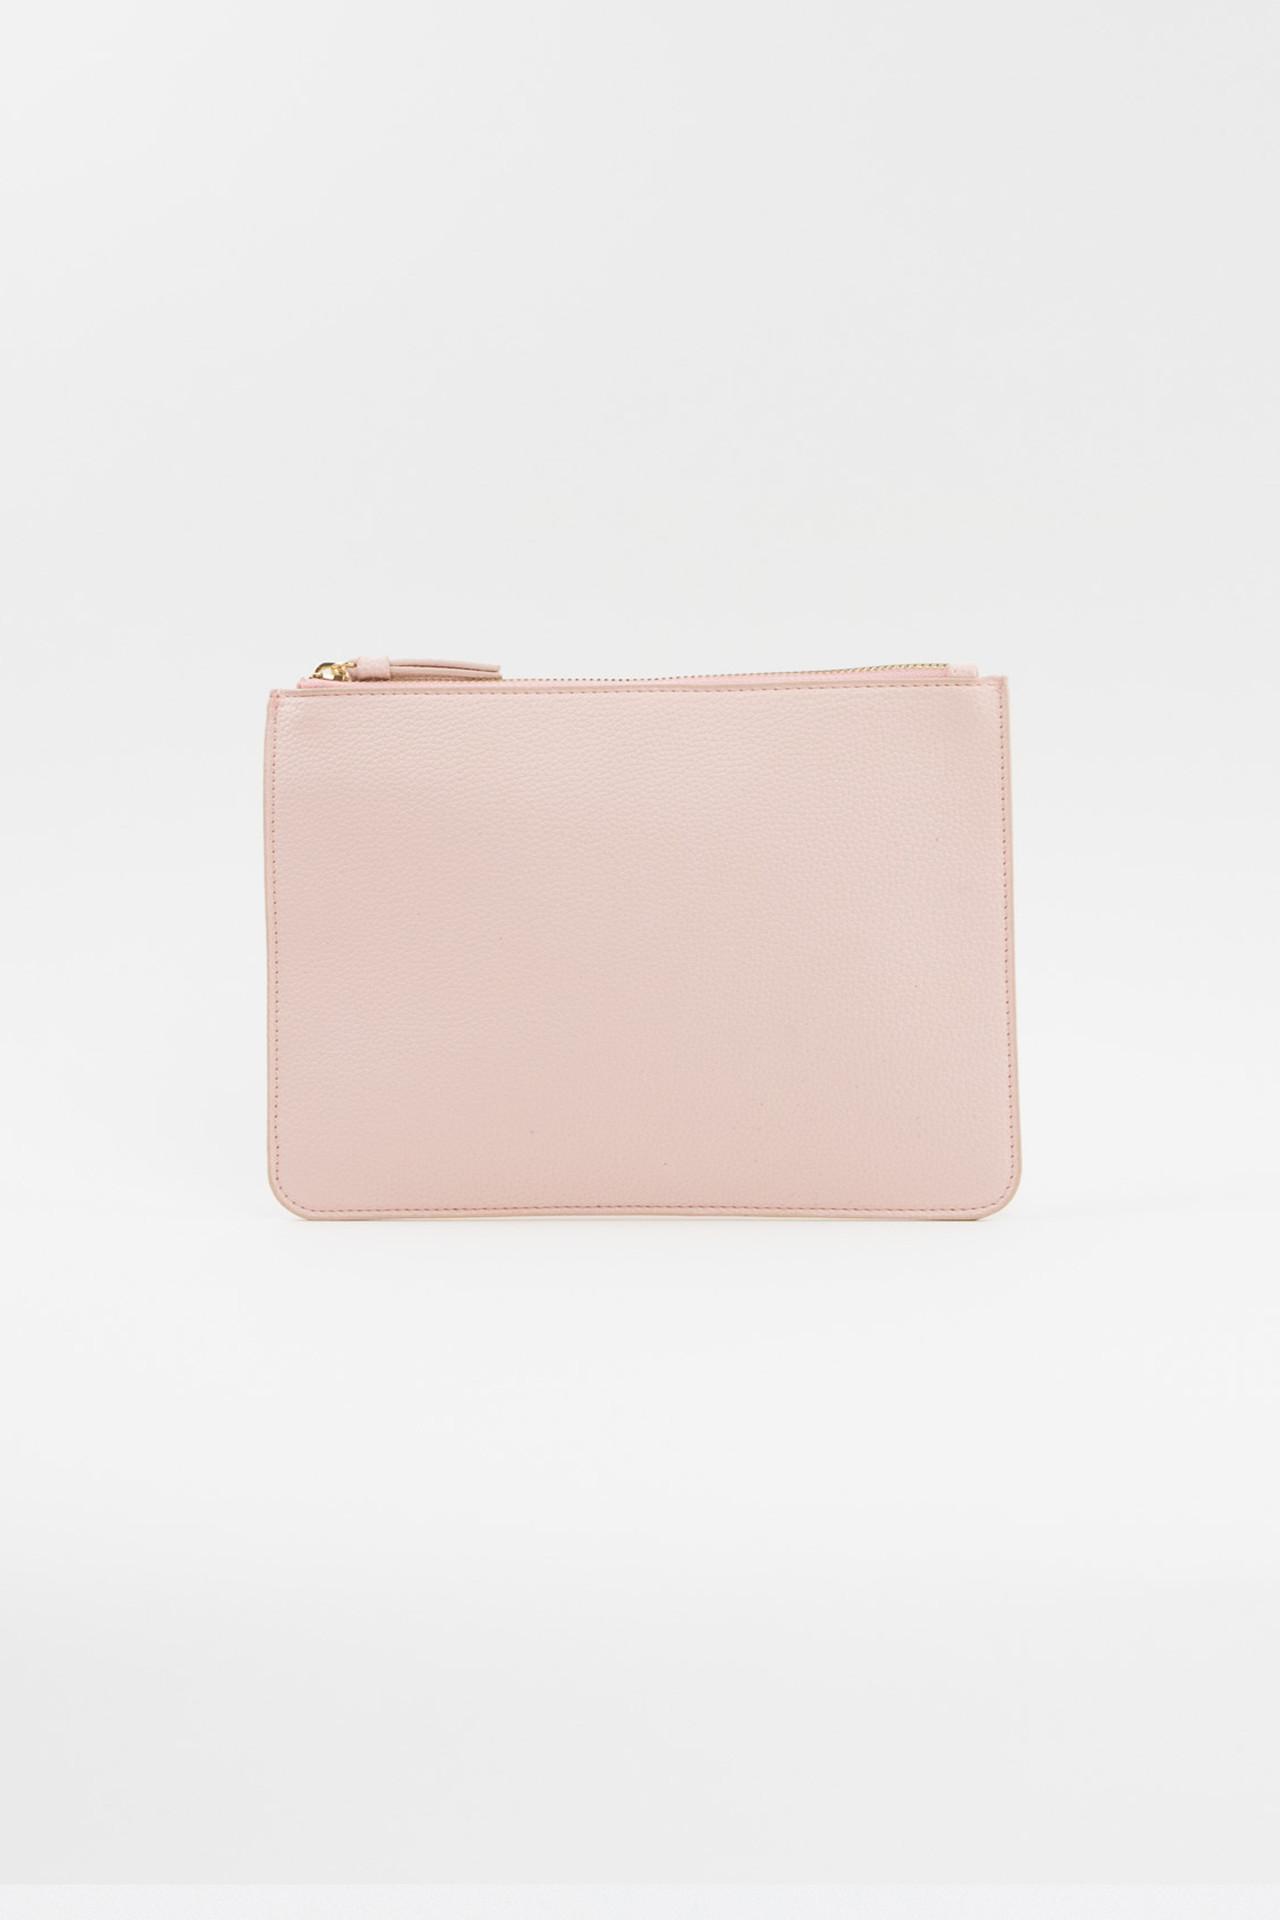 Vegan Leather Clutch - Blush